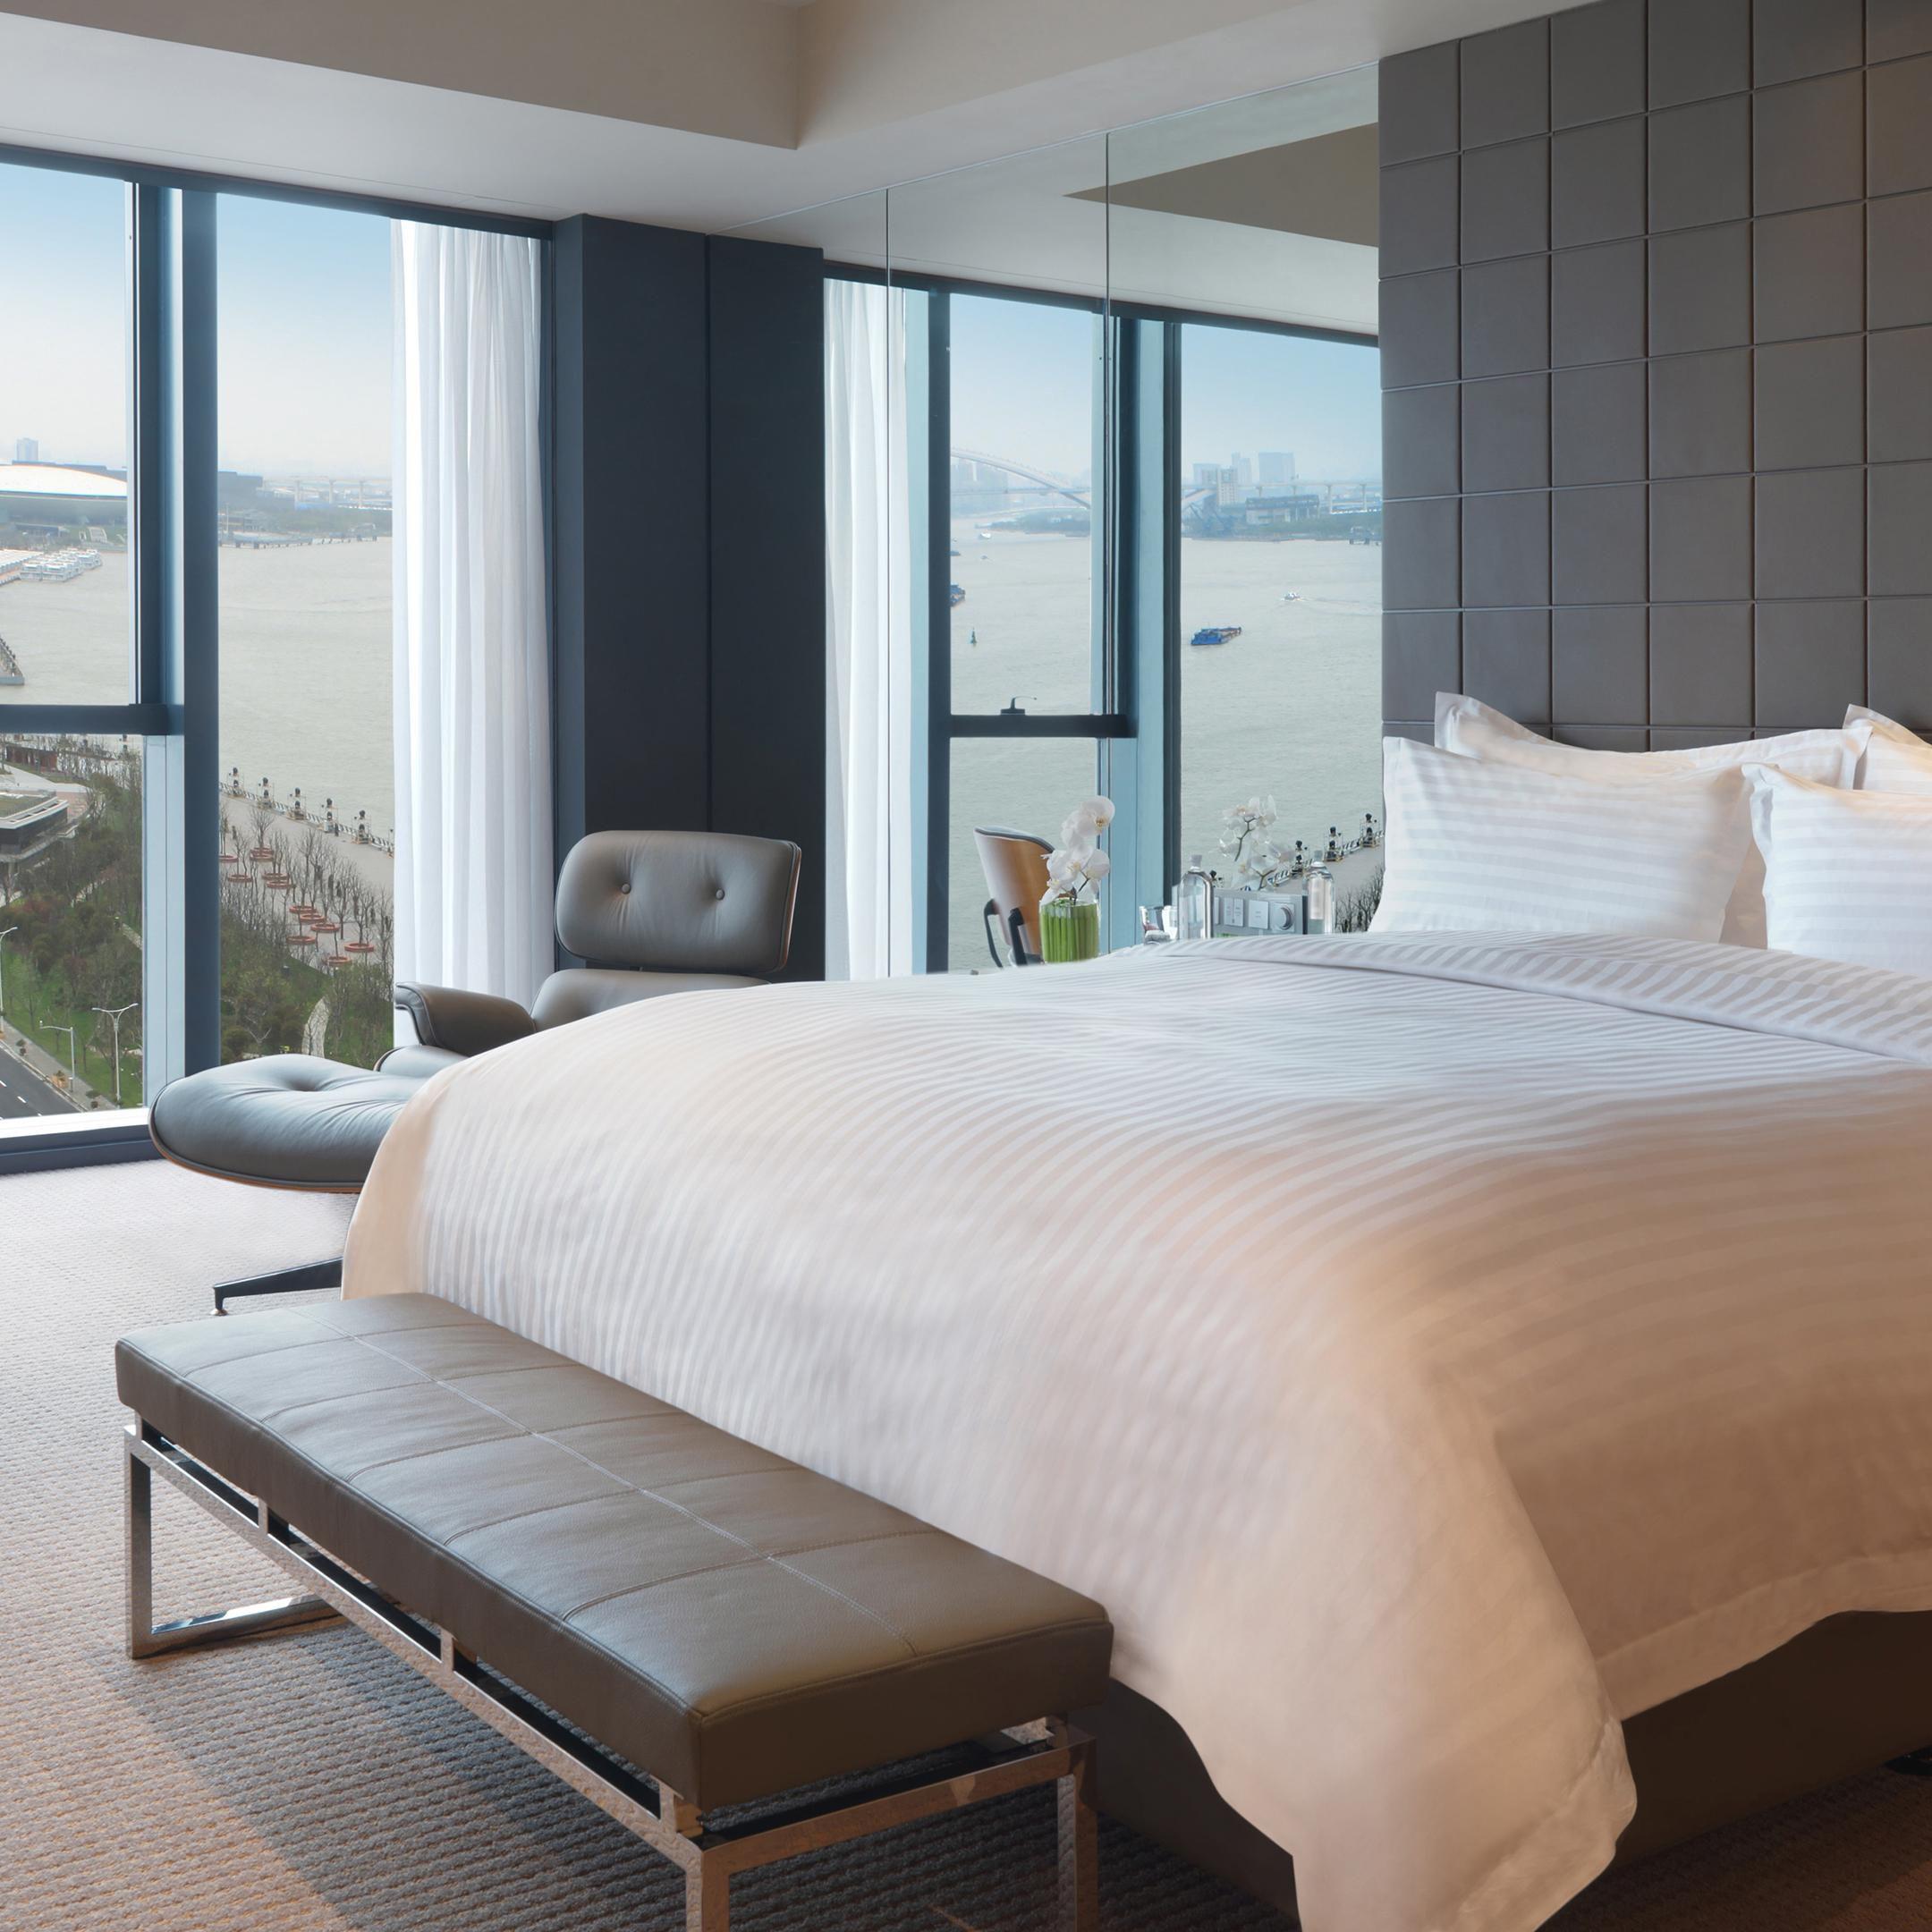 Shanghai Hotels: InterContinental Shanghai Expo Hotel in Shanghai, China